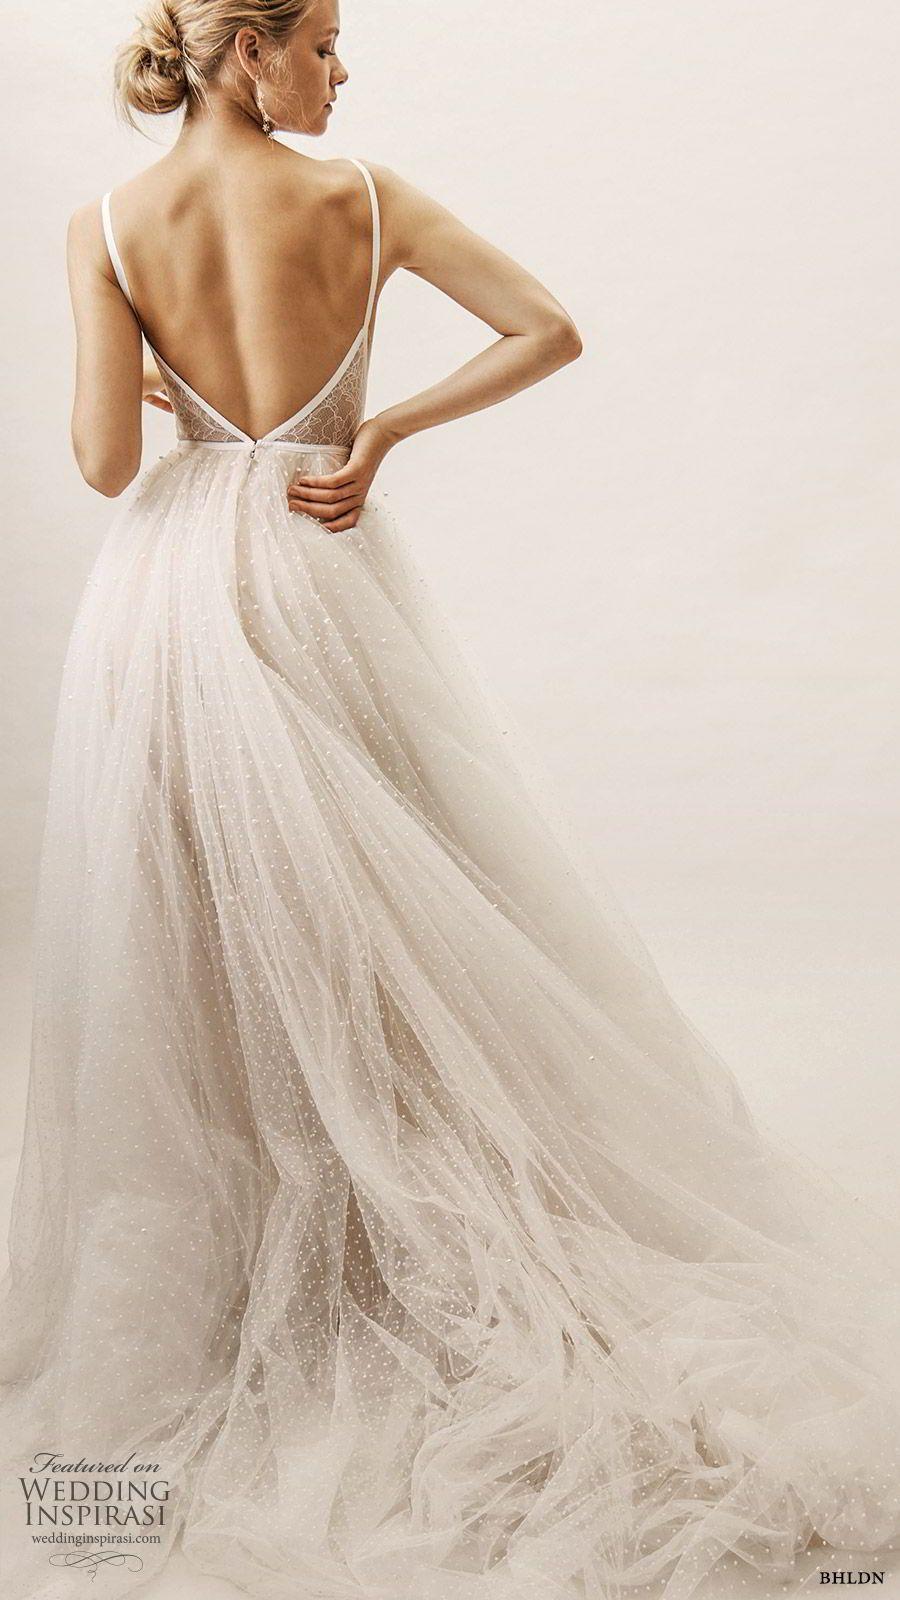 Photo of BHLDN's New Spring 2019 Wedding Dresses | Wedding Inspirasi